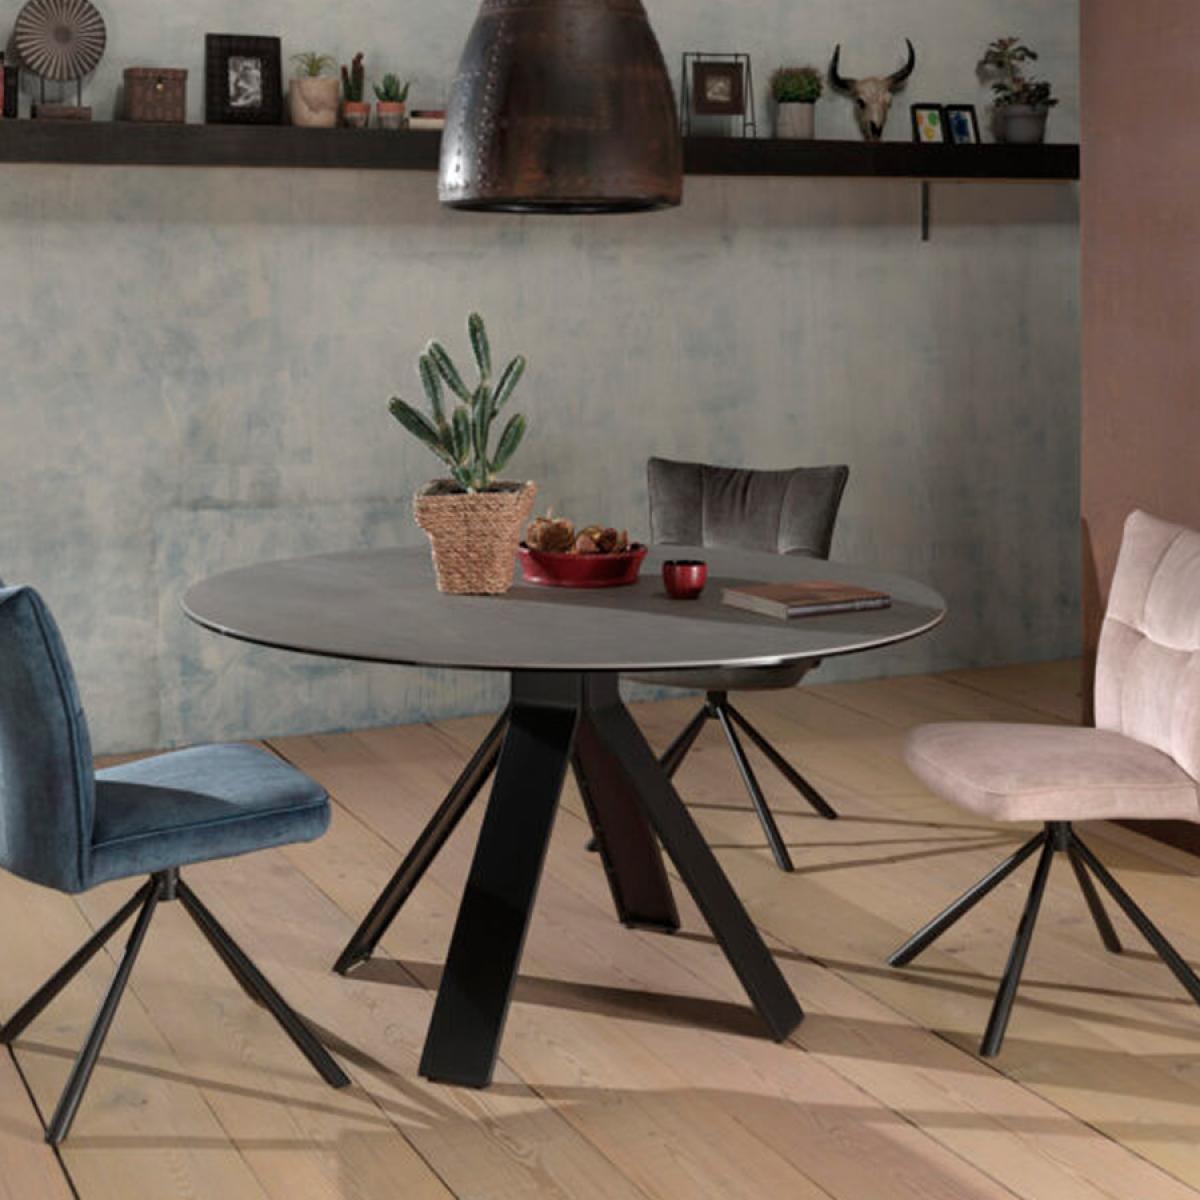 Nouvomeuble Table ronde 130 cm en céramique grise CAMARGUE